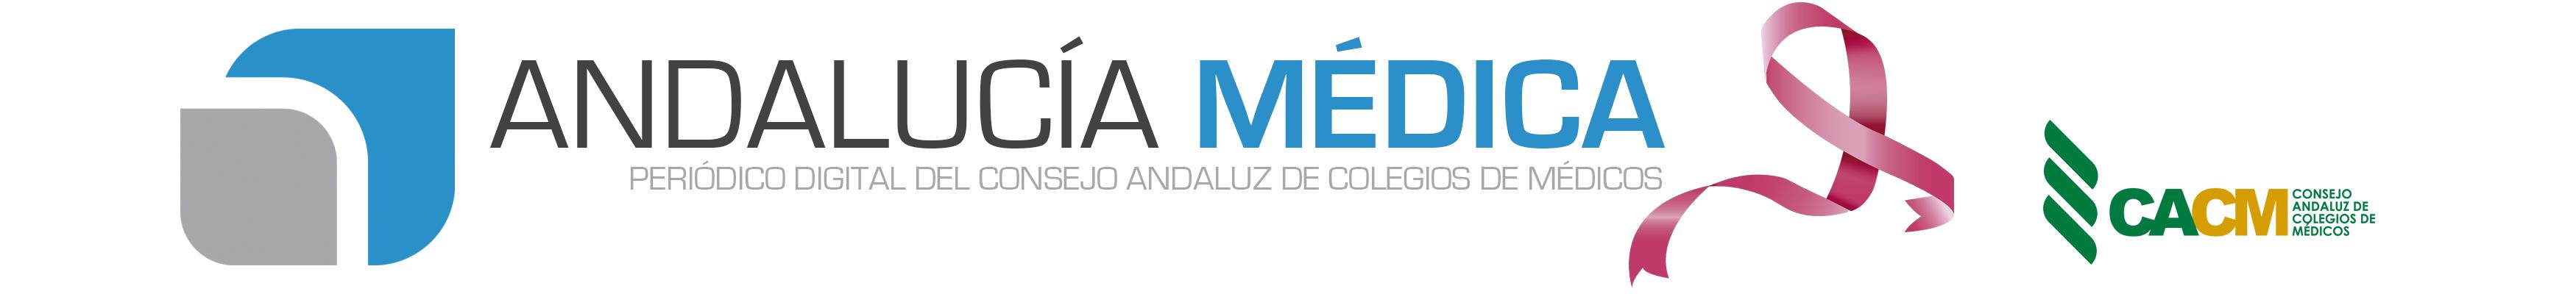 Andalucía Médica